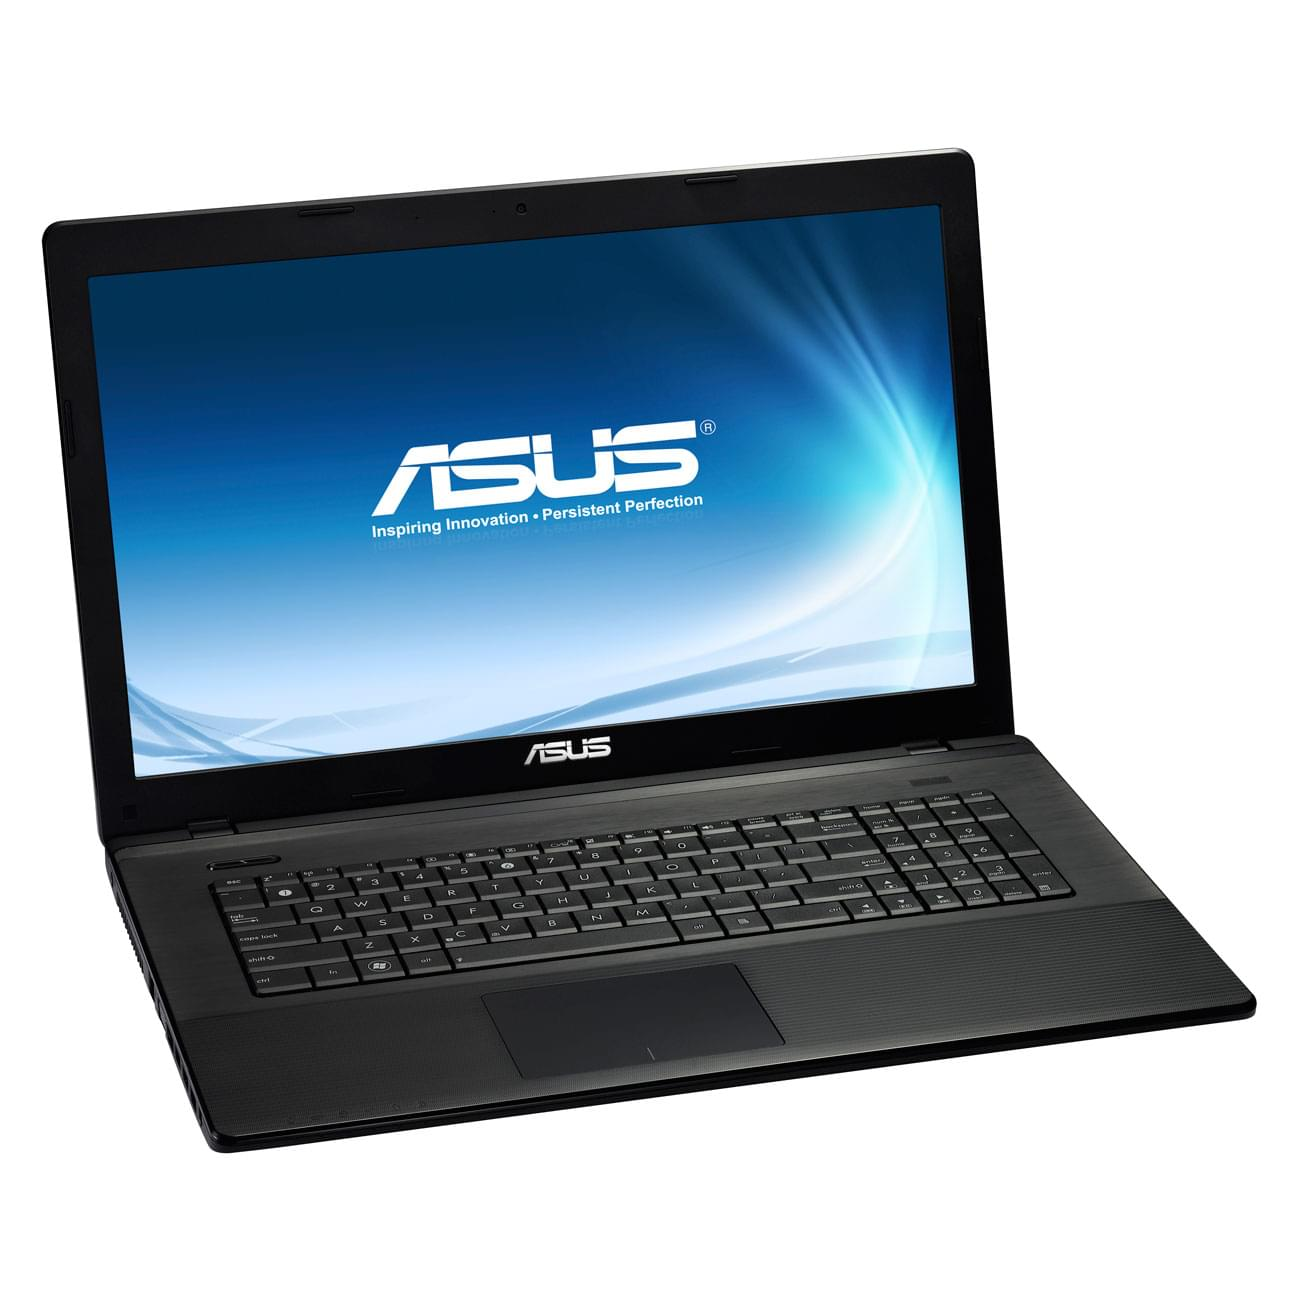 Asus X75VD-TY082H (X75VD-TY082H) - Achat / Vente PC Portable sur Cybertek.fr - 0